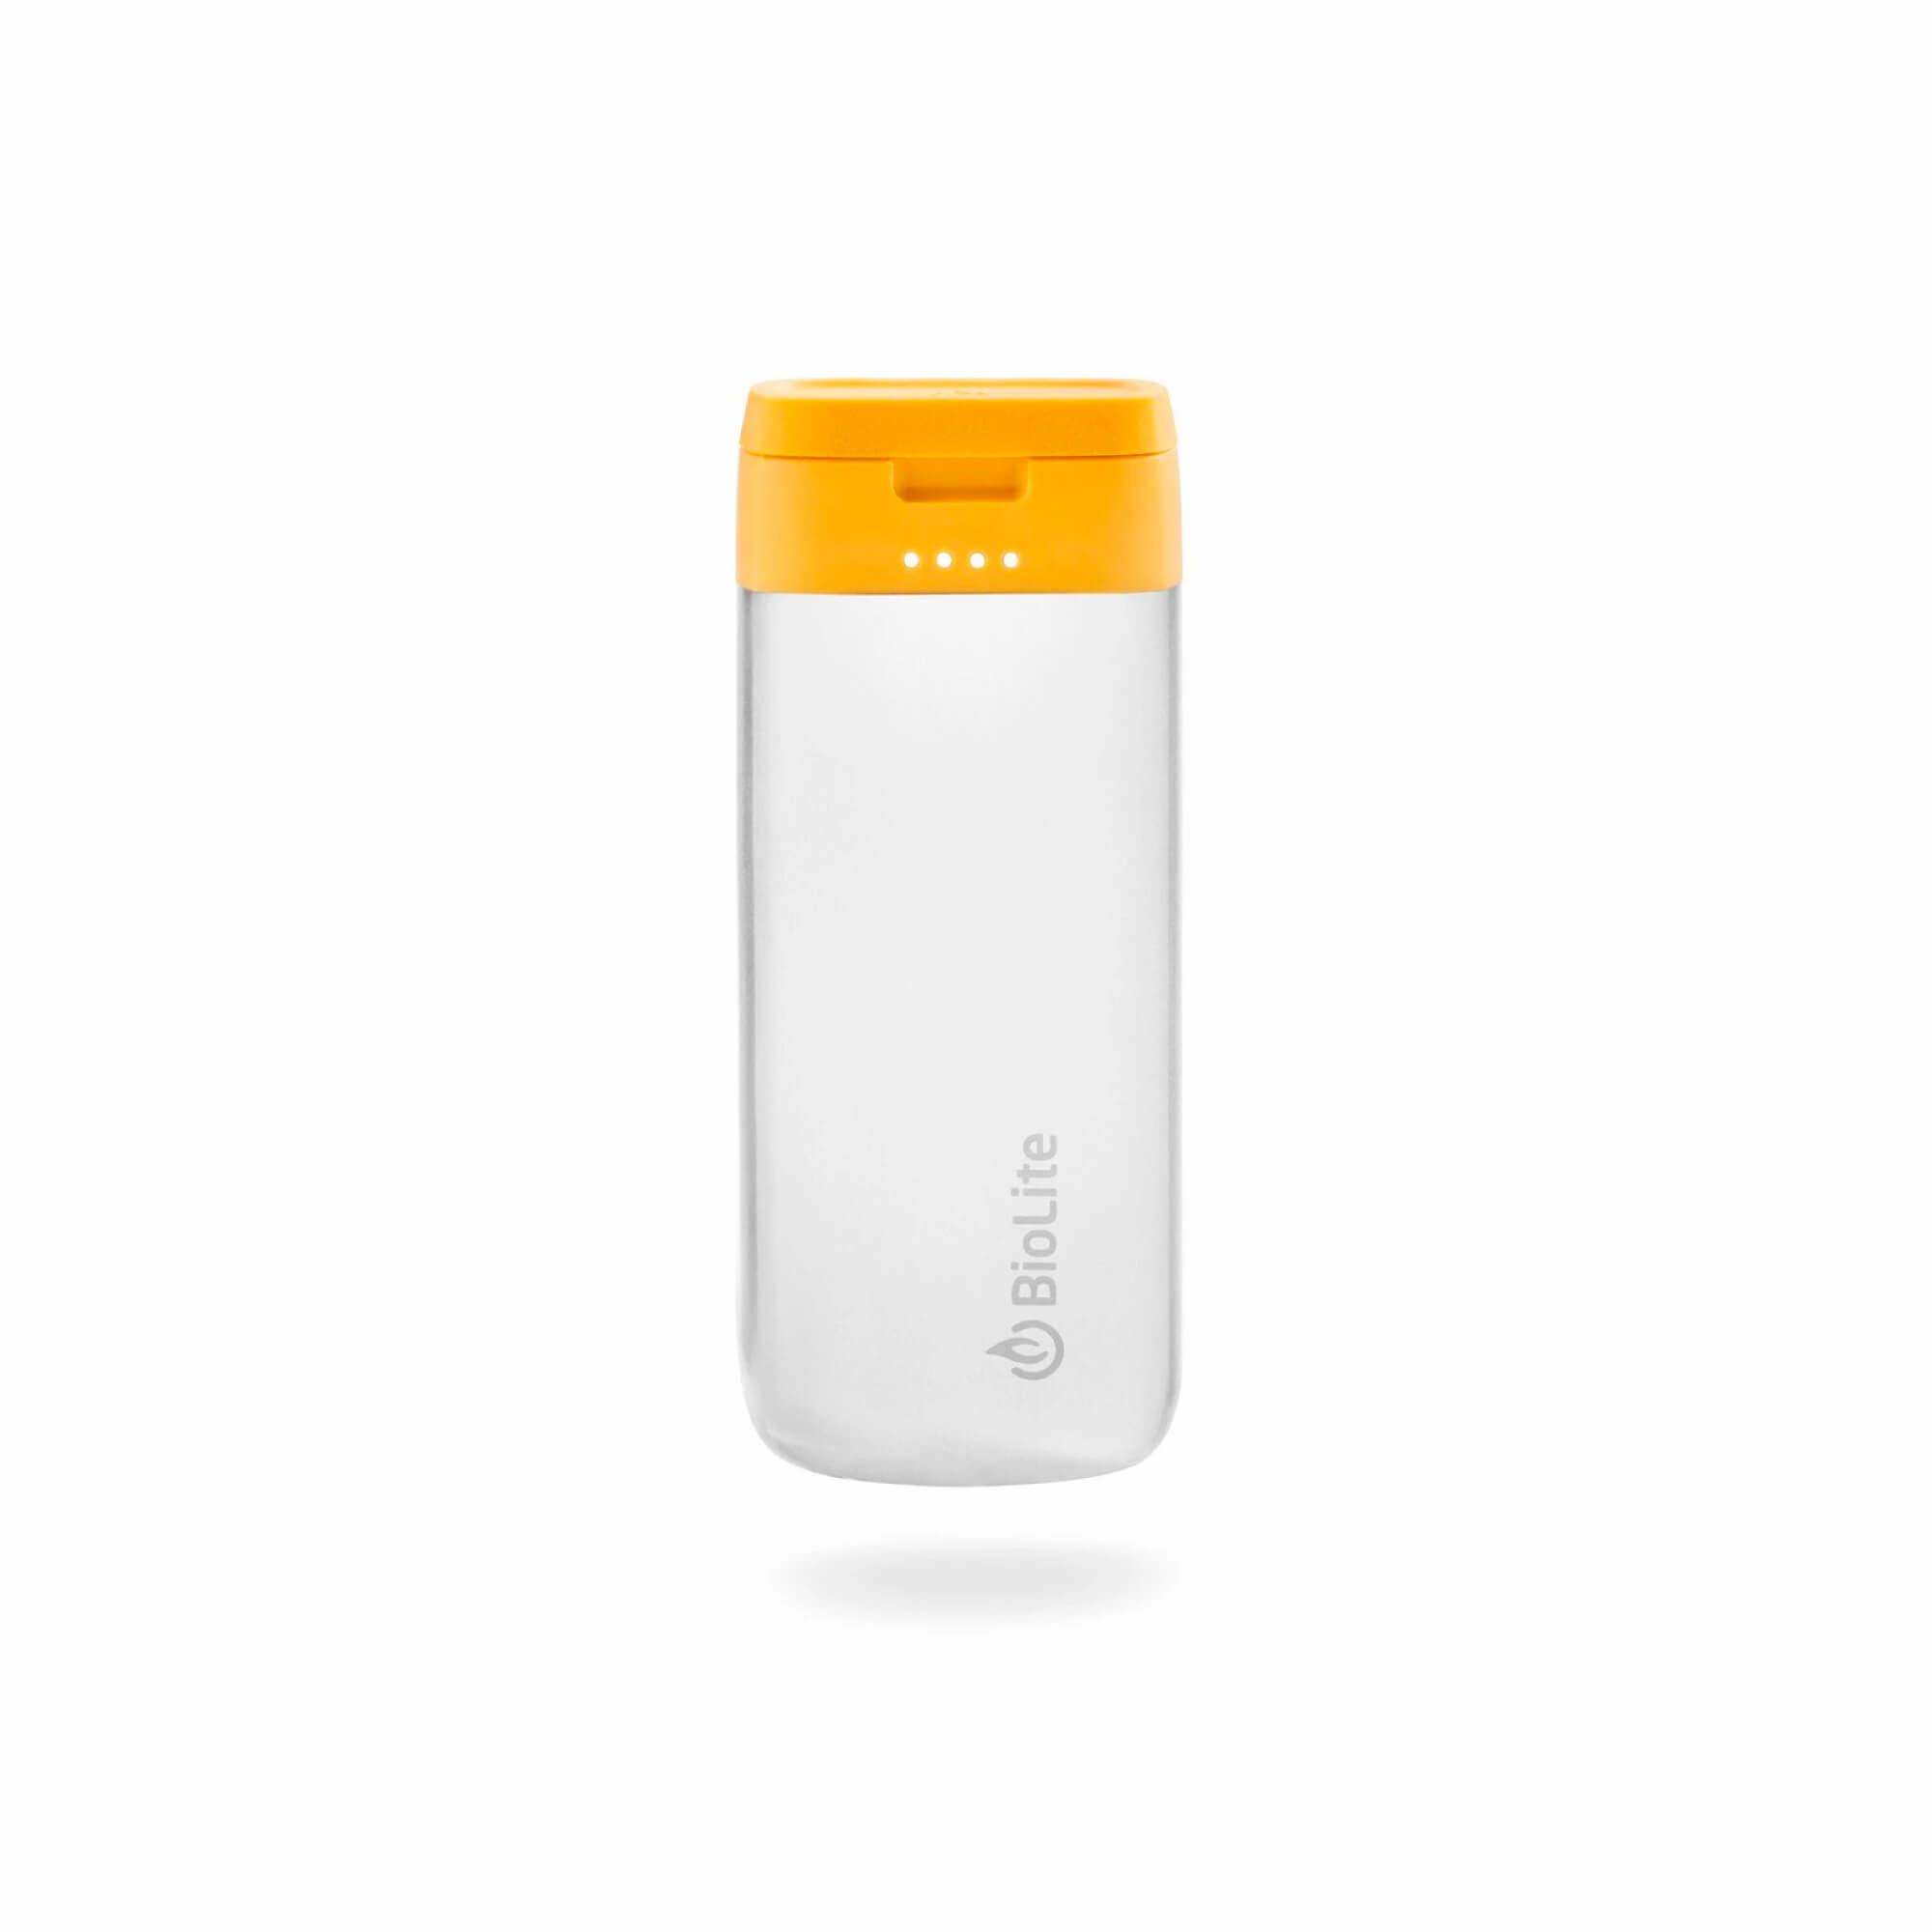 BioLite Charge USB Power Pack-8